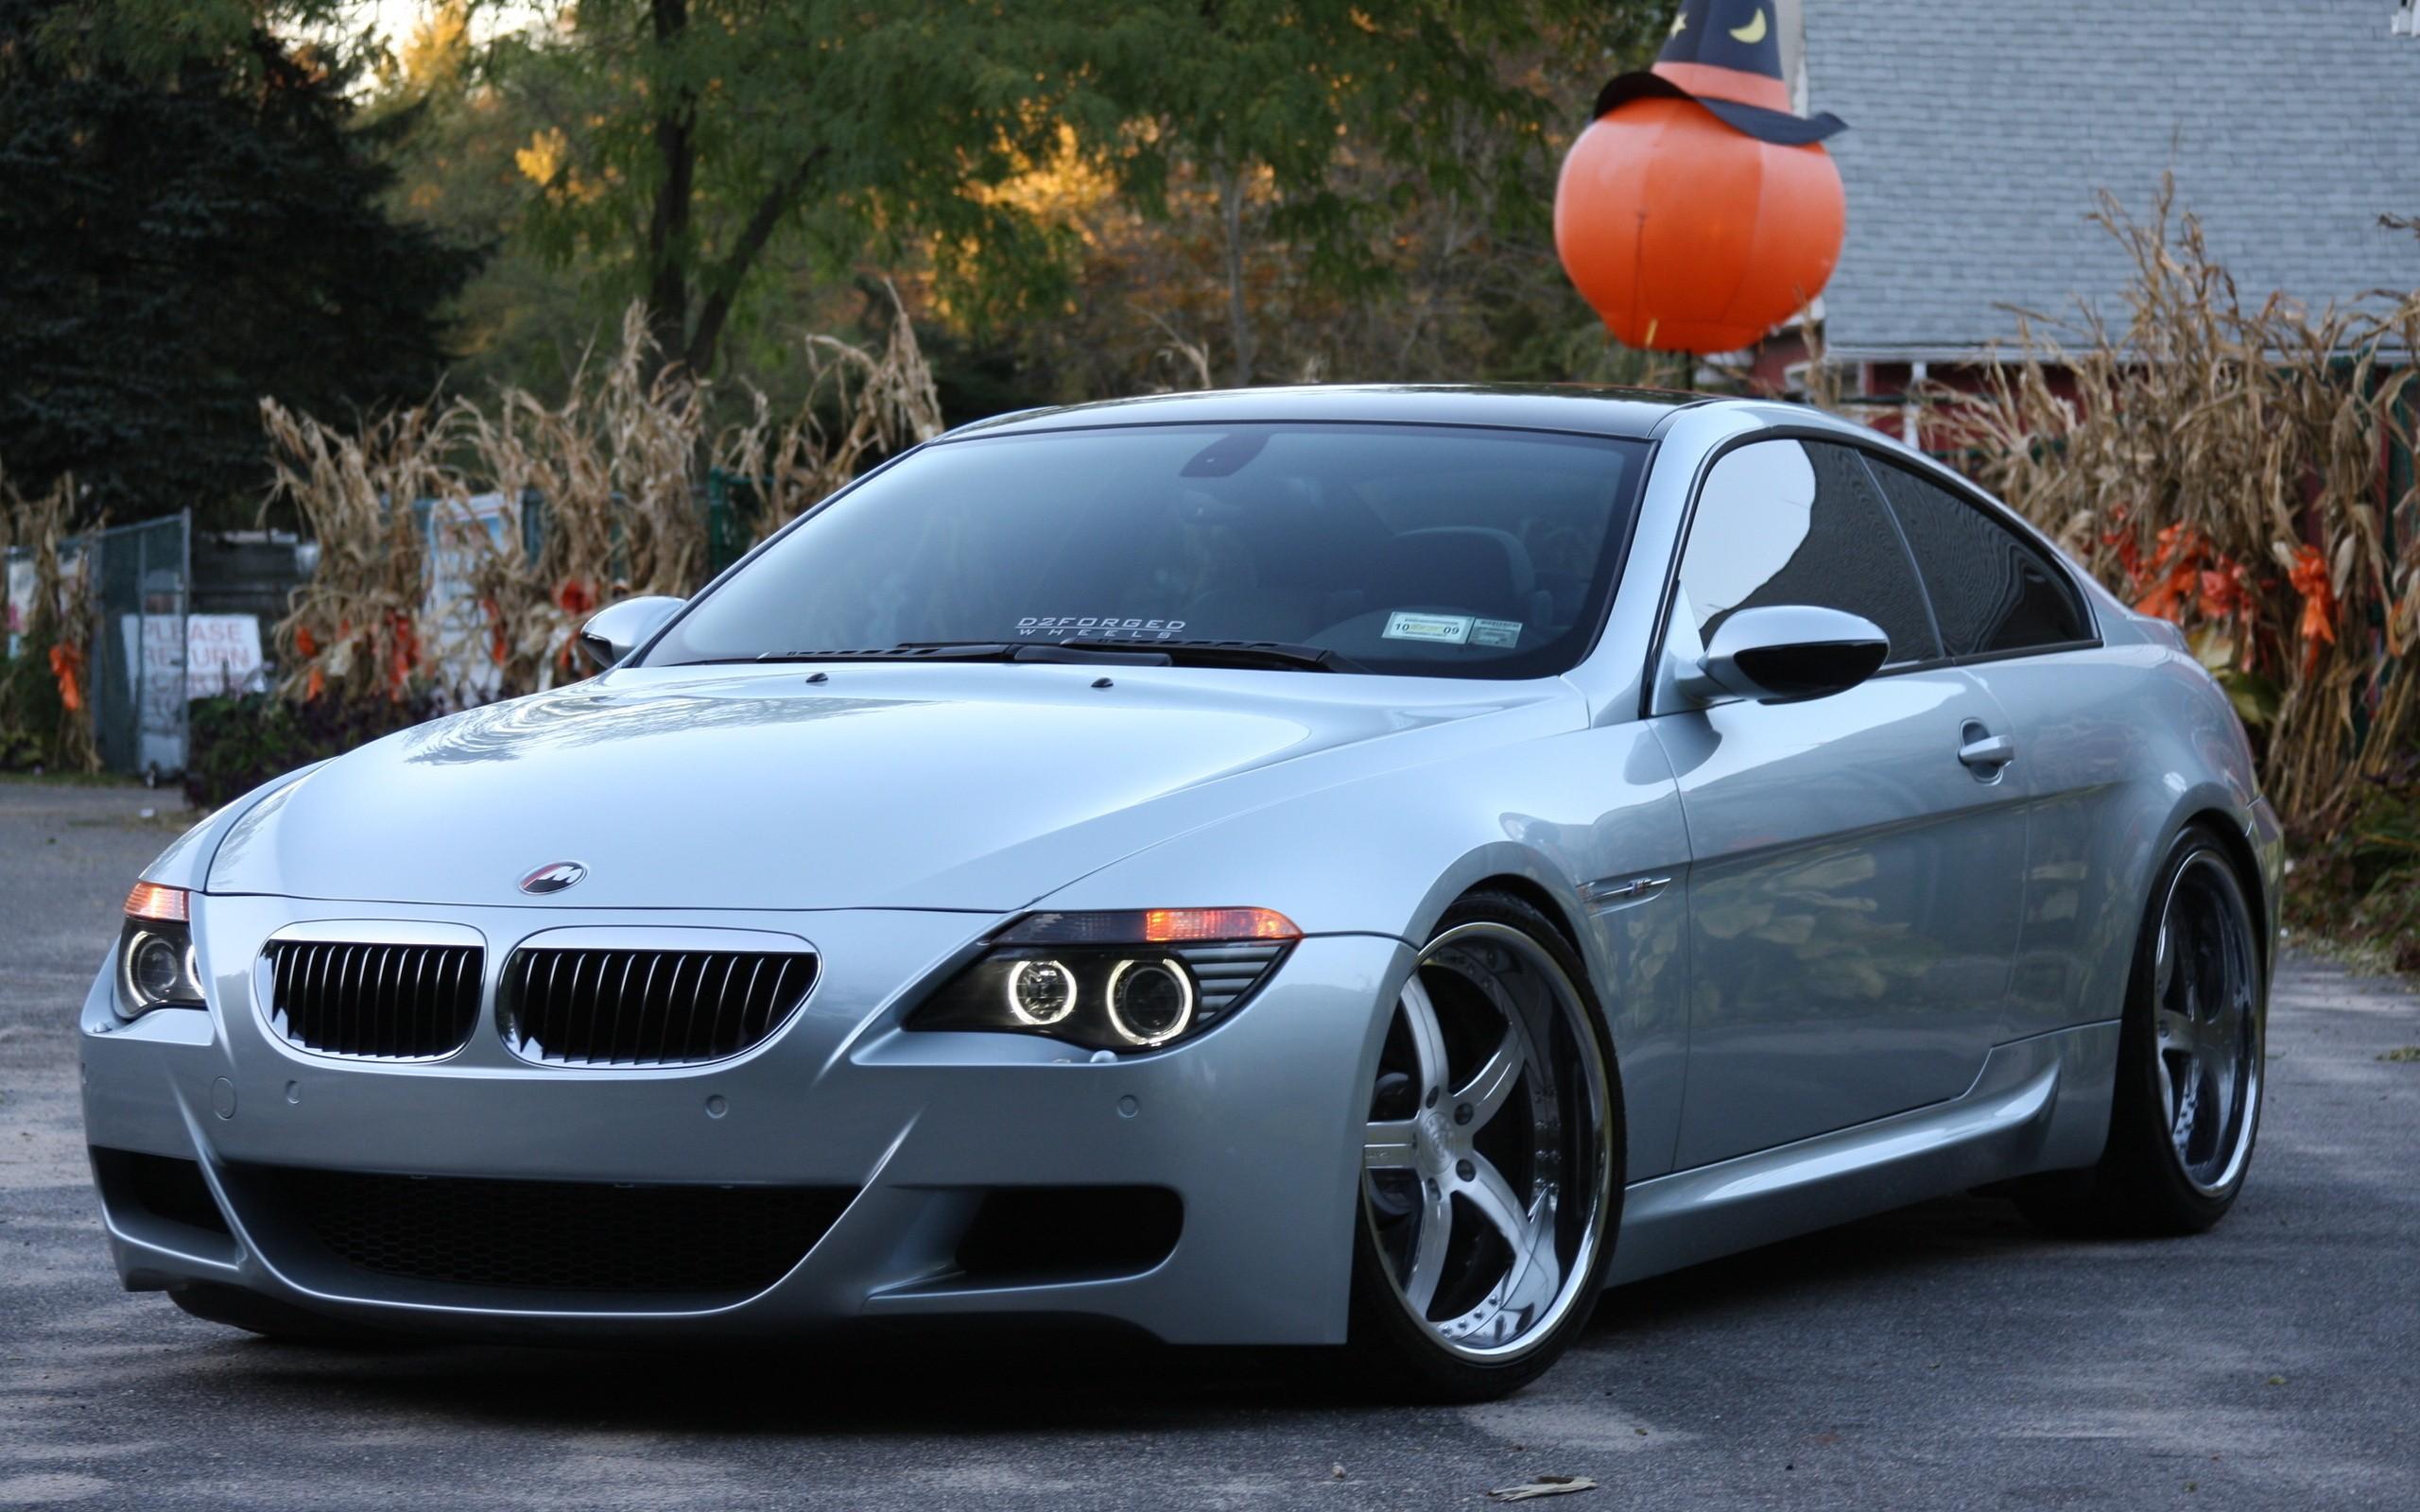 Wallpaper : sports car, gray, coupe, Convertible, BMW M6 ...